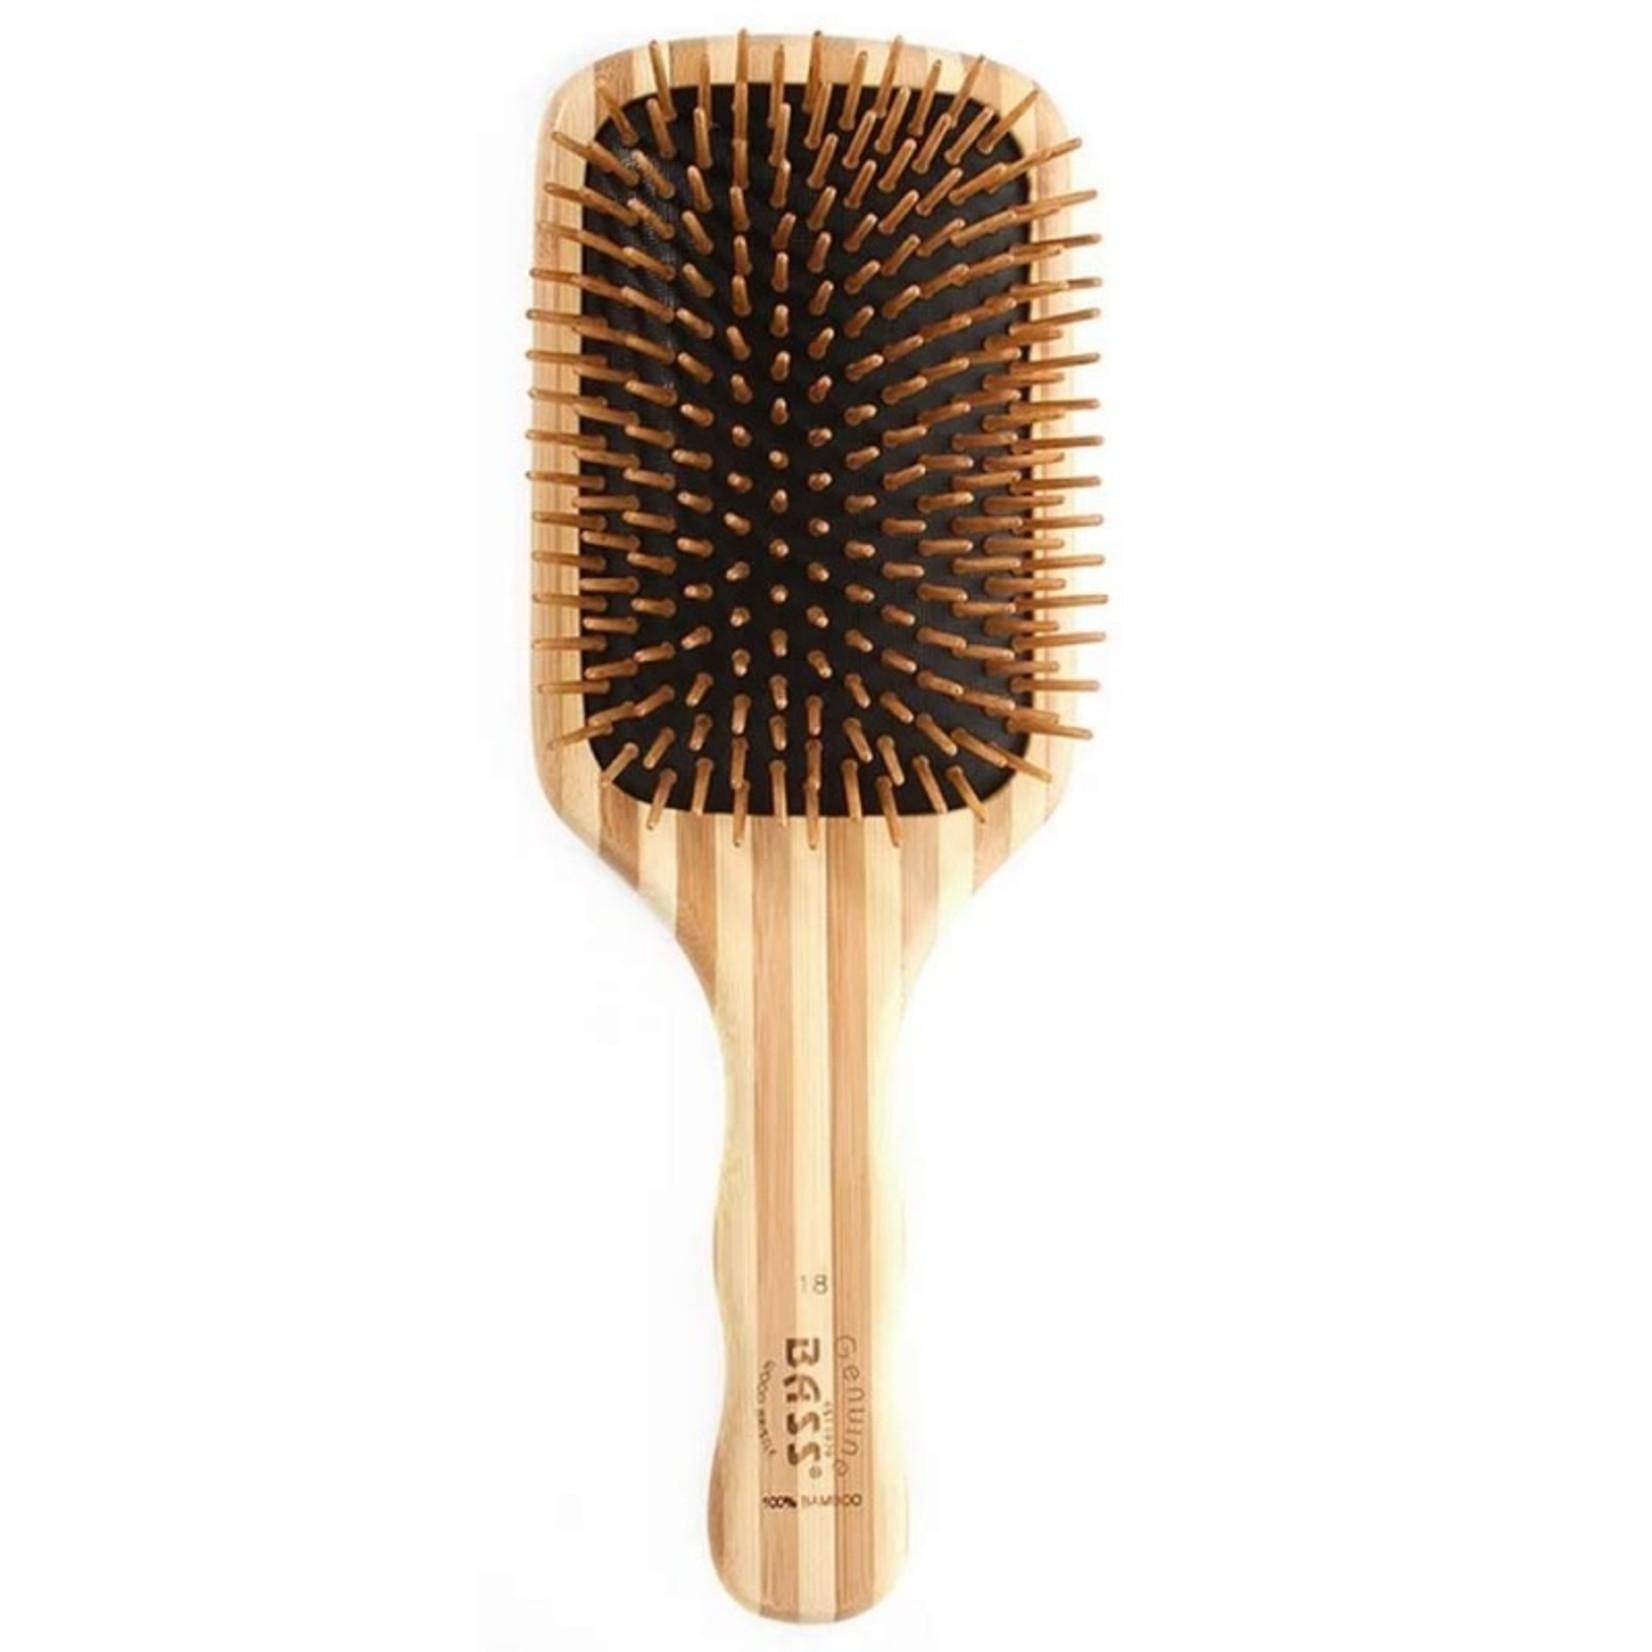 Bass Bass Hair Brush Large Square Paddle